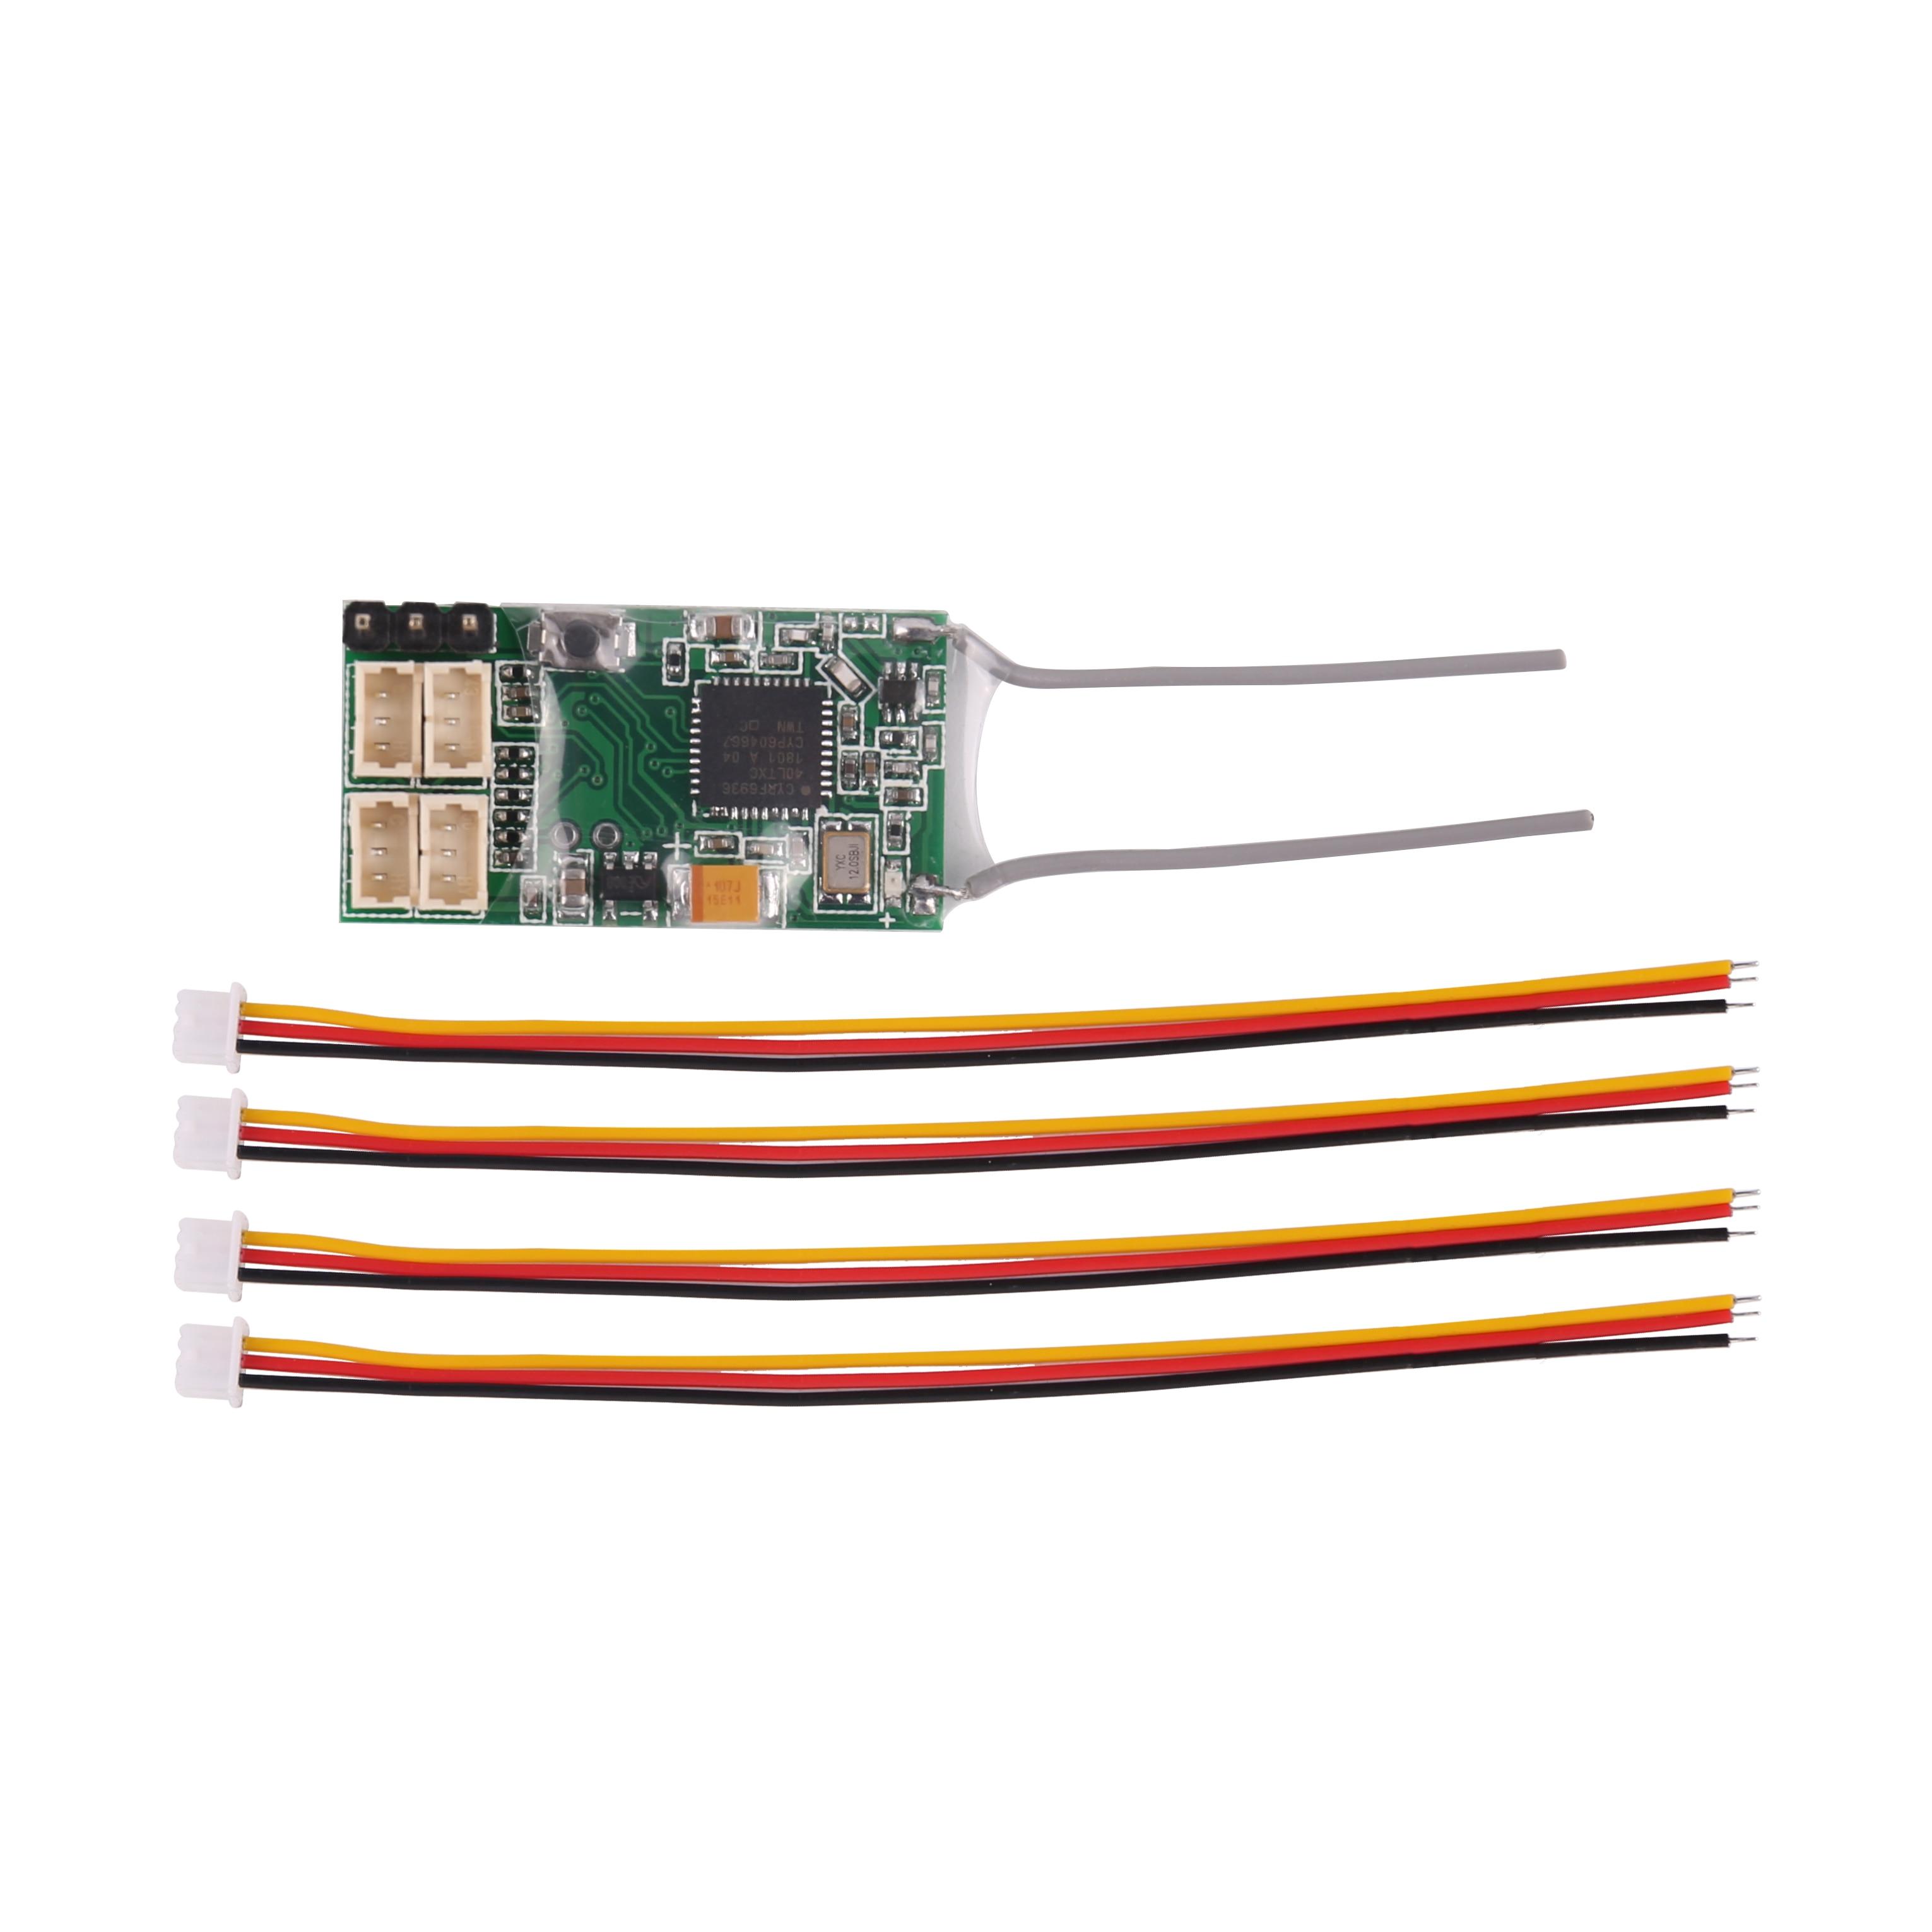 Receptor remoto Dsmx DSM2 para transmisor Spektrum DX6I DX18 DX8 DX9 dev10, receptor REDCON CM410X-4Ch PPM JST 2,4G